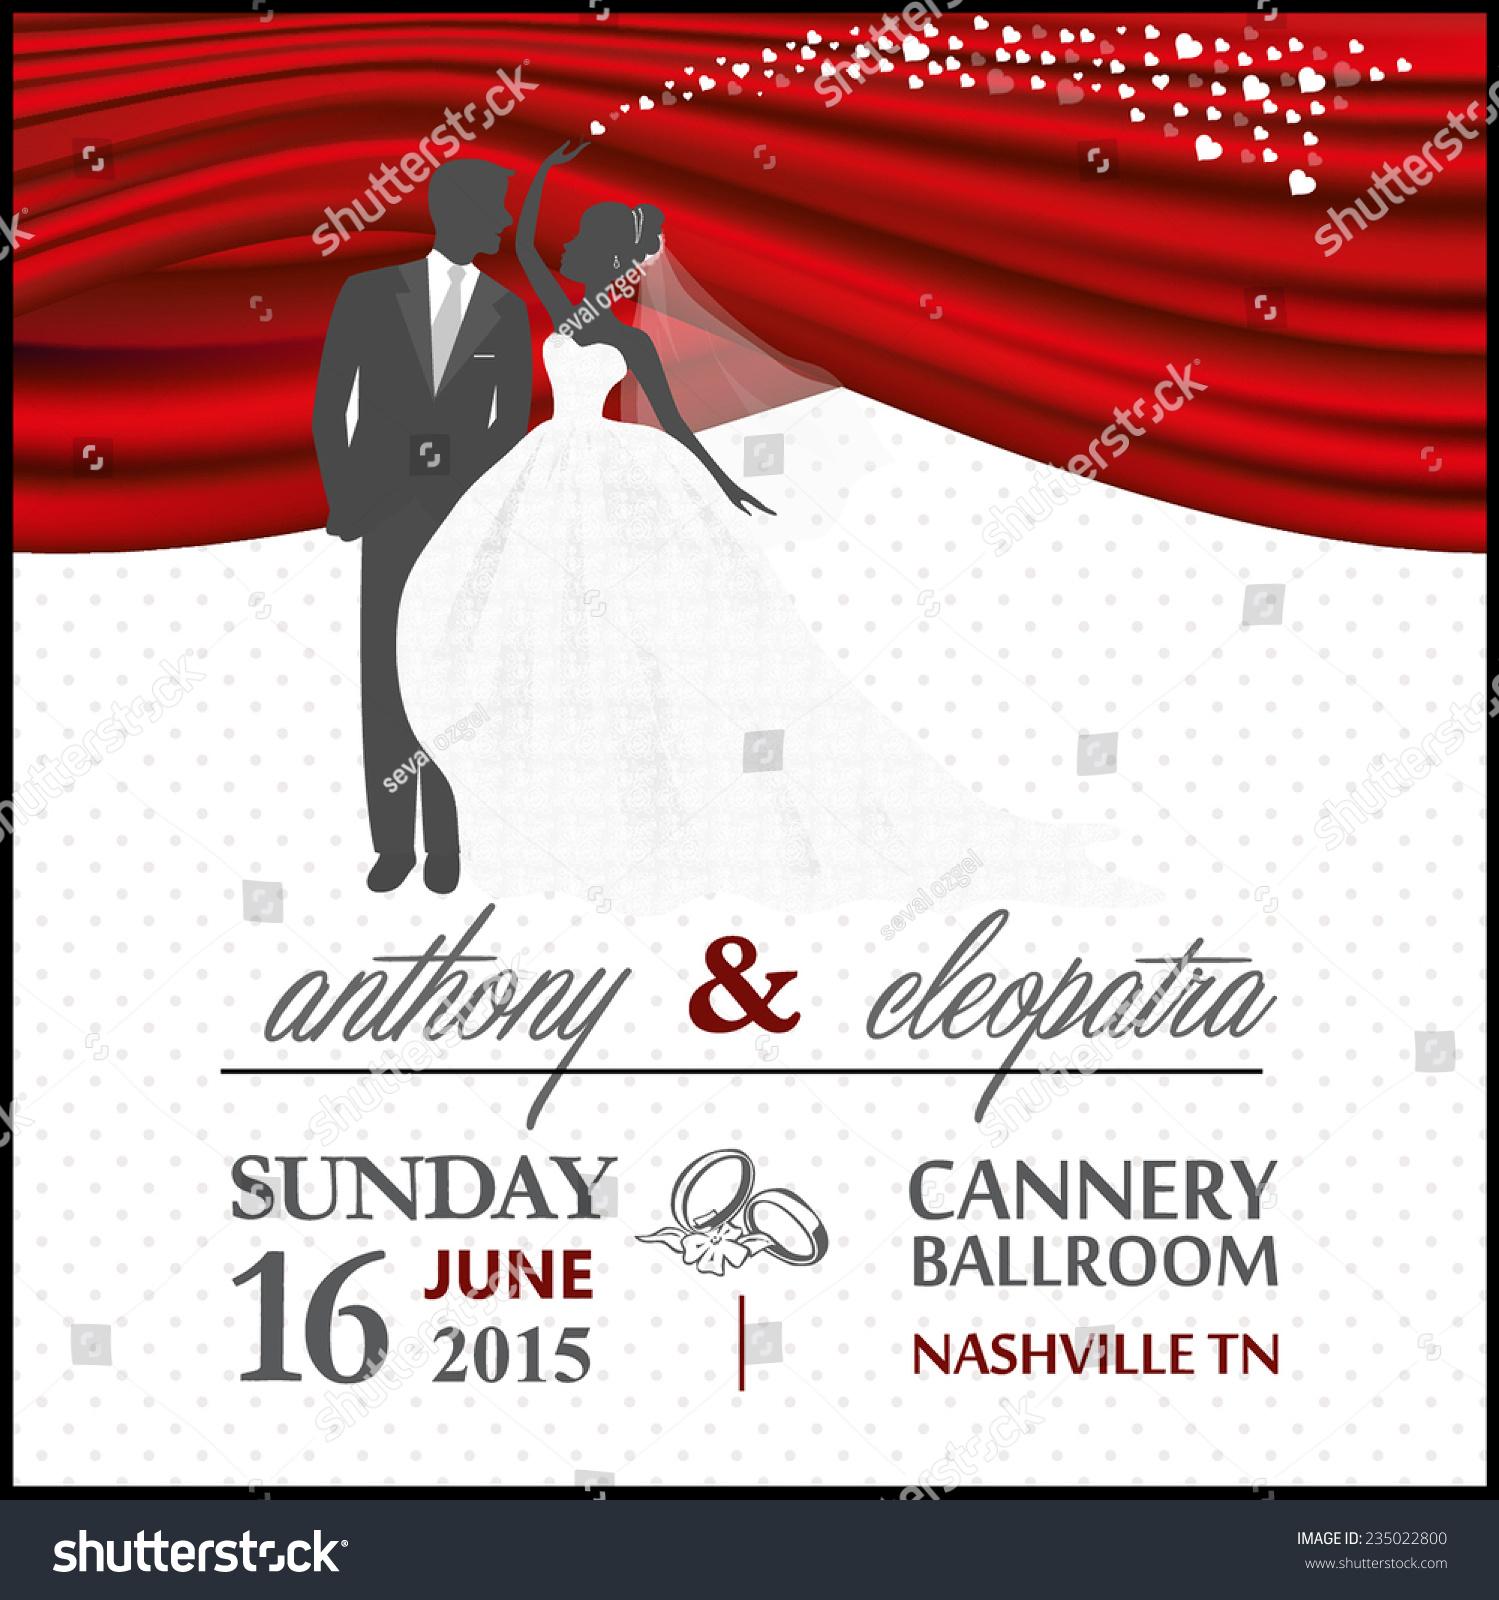 Red Black Groom Bride Wedding Invitation Stock Vector HD (Royalty ...